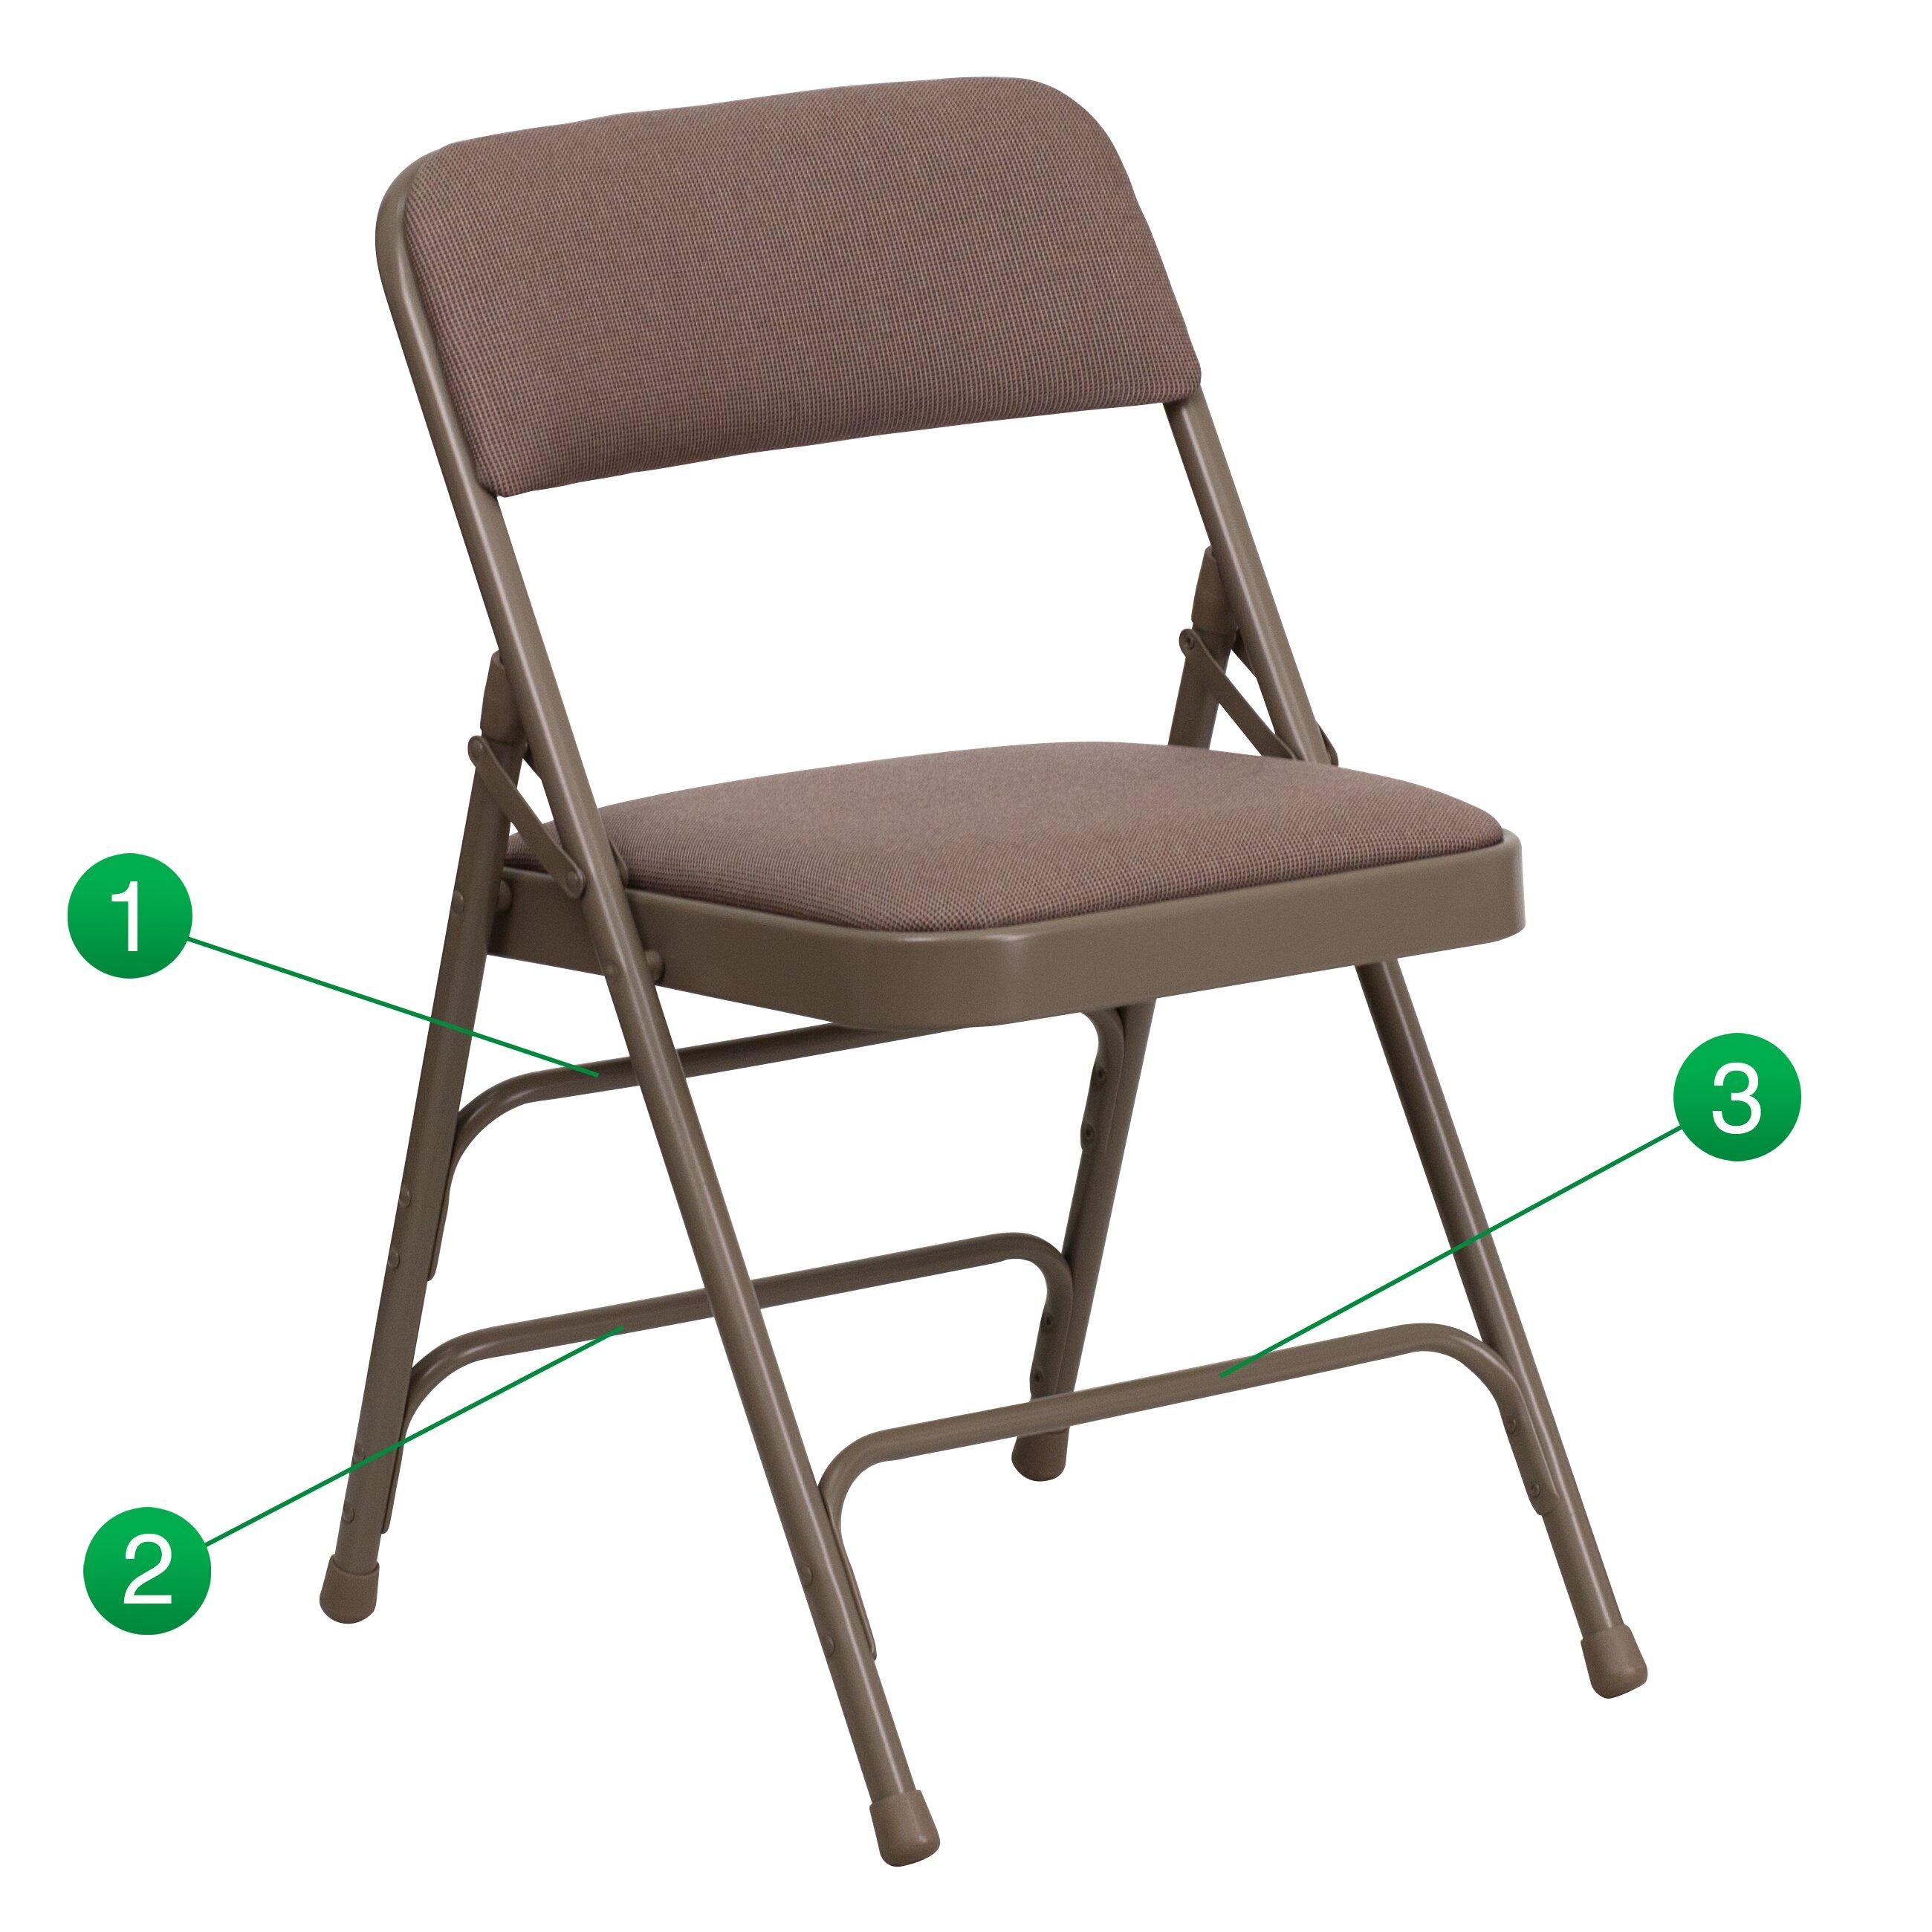 Flash furniture hercules series folding chair reviews for Wayfair shop furniture